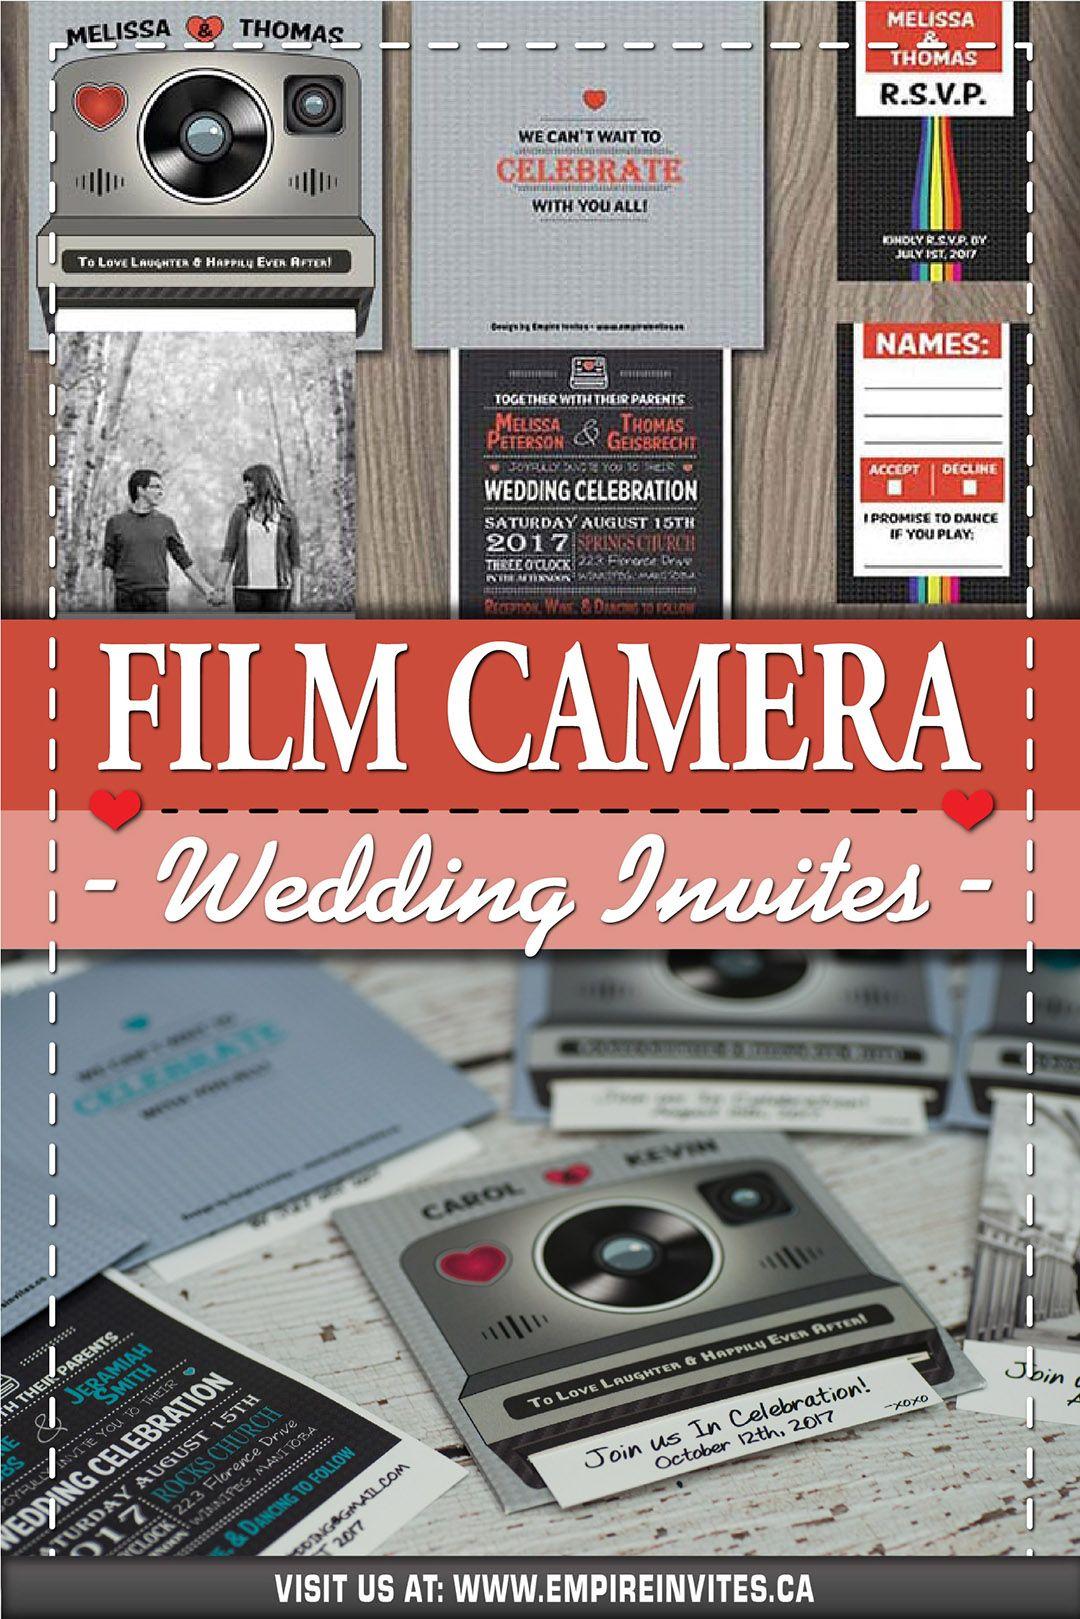 Cheap Online interactive instant film camera wedding invitations From Canada  | Empire Invites, Winnipeg | Instant film camera, Film camera, Wedding  invitations